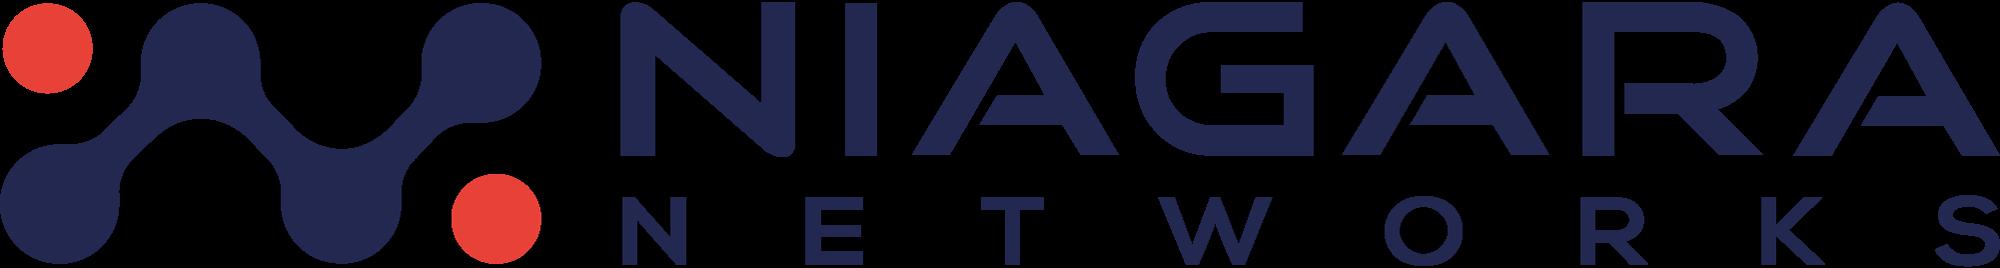 Niagara Network Packet Brokers